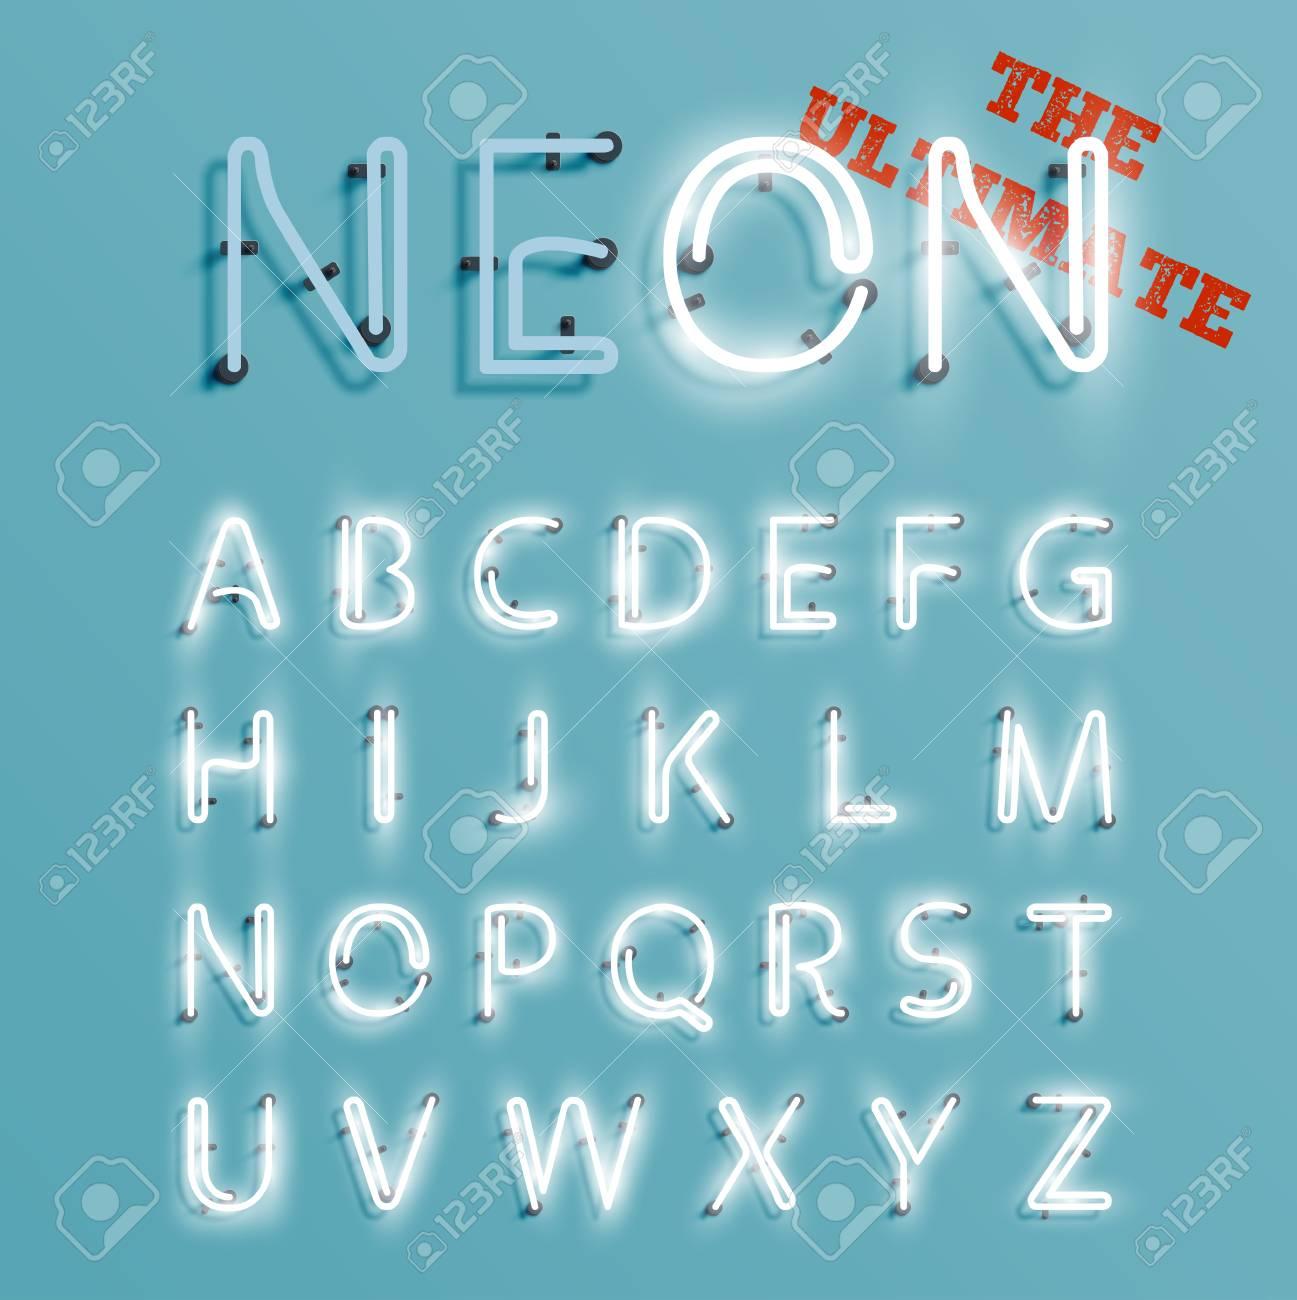 Realistic neon character set, vector illustration - 125021124